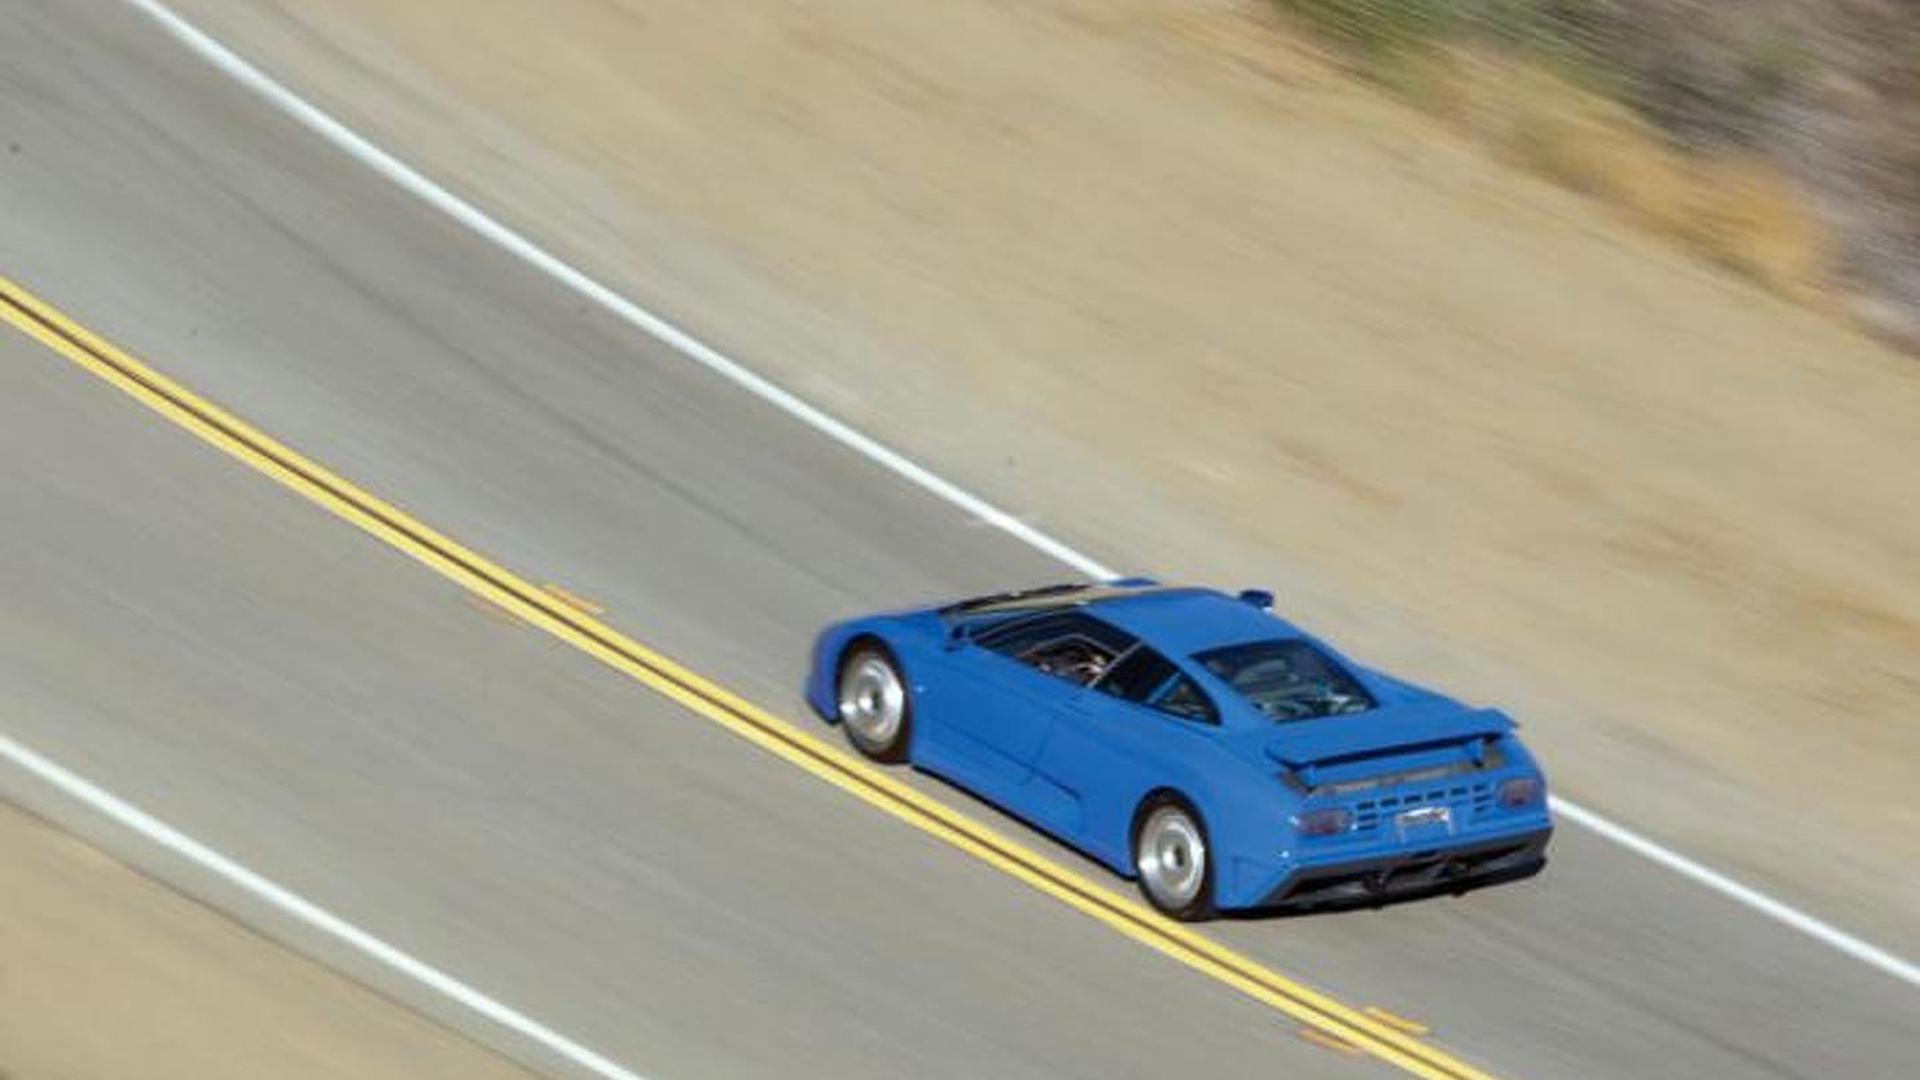 Фото Bugatti EB110 GT 1993 года выпуска